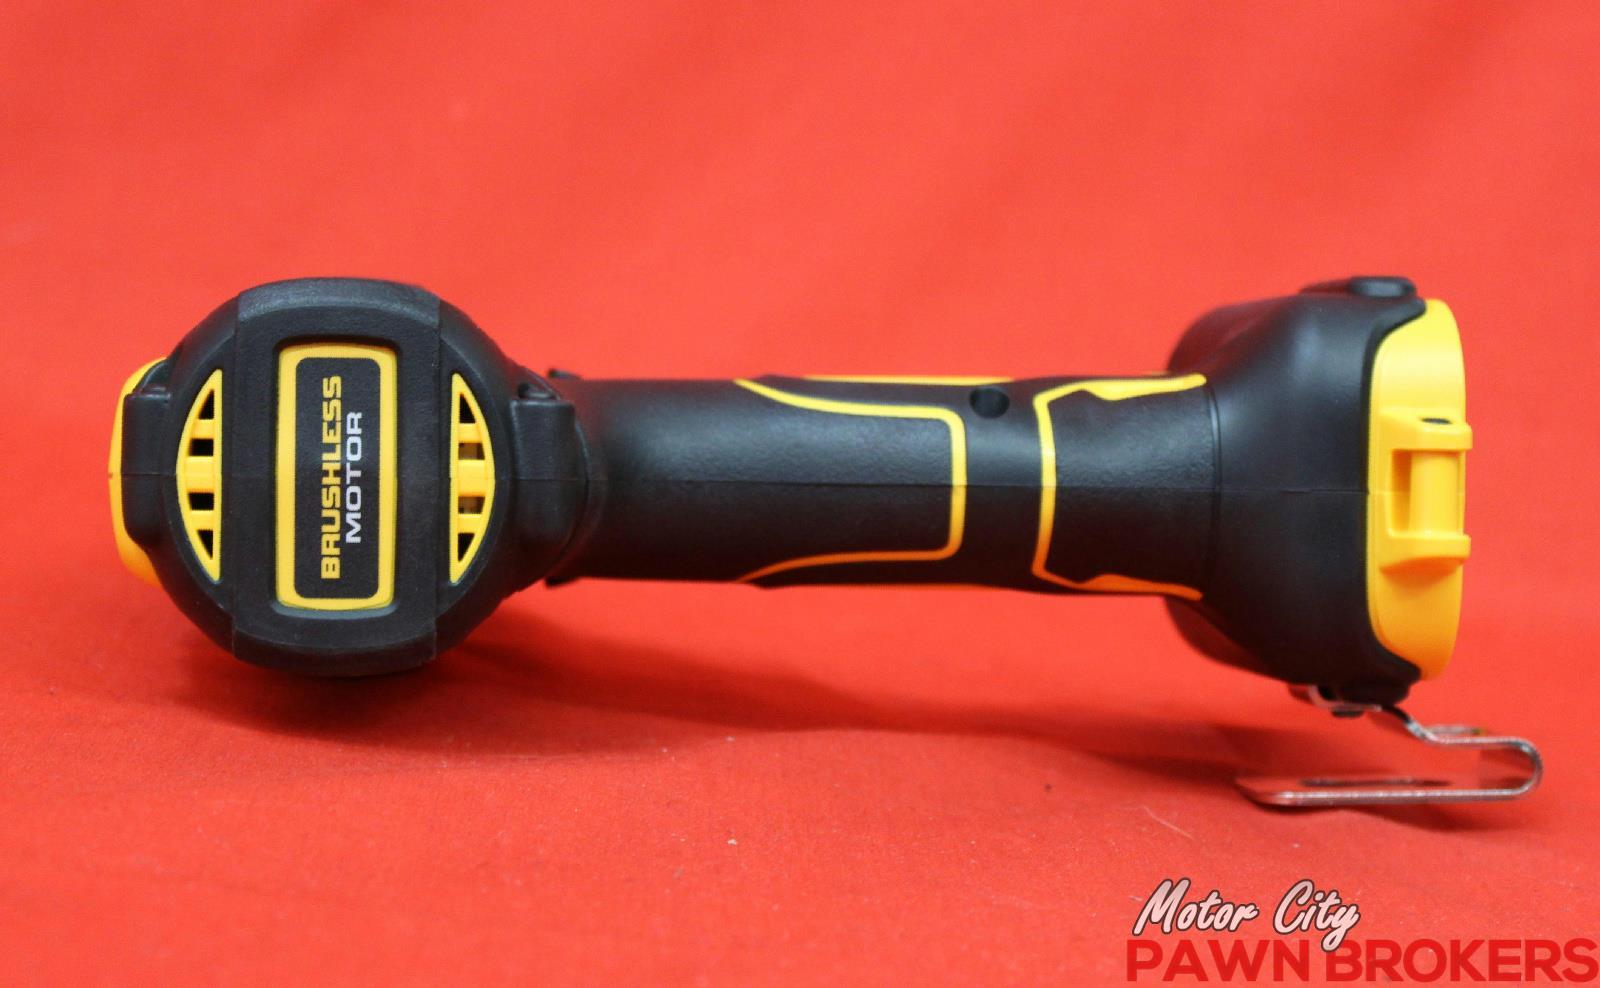 Dewalt dcd791 20v max xr brushless 1 2 cordless drill for Motor city pawn shop